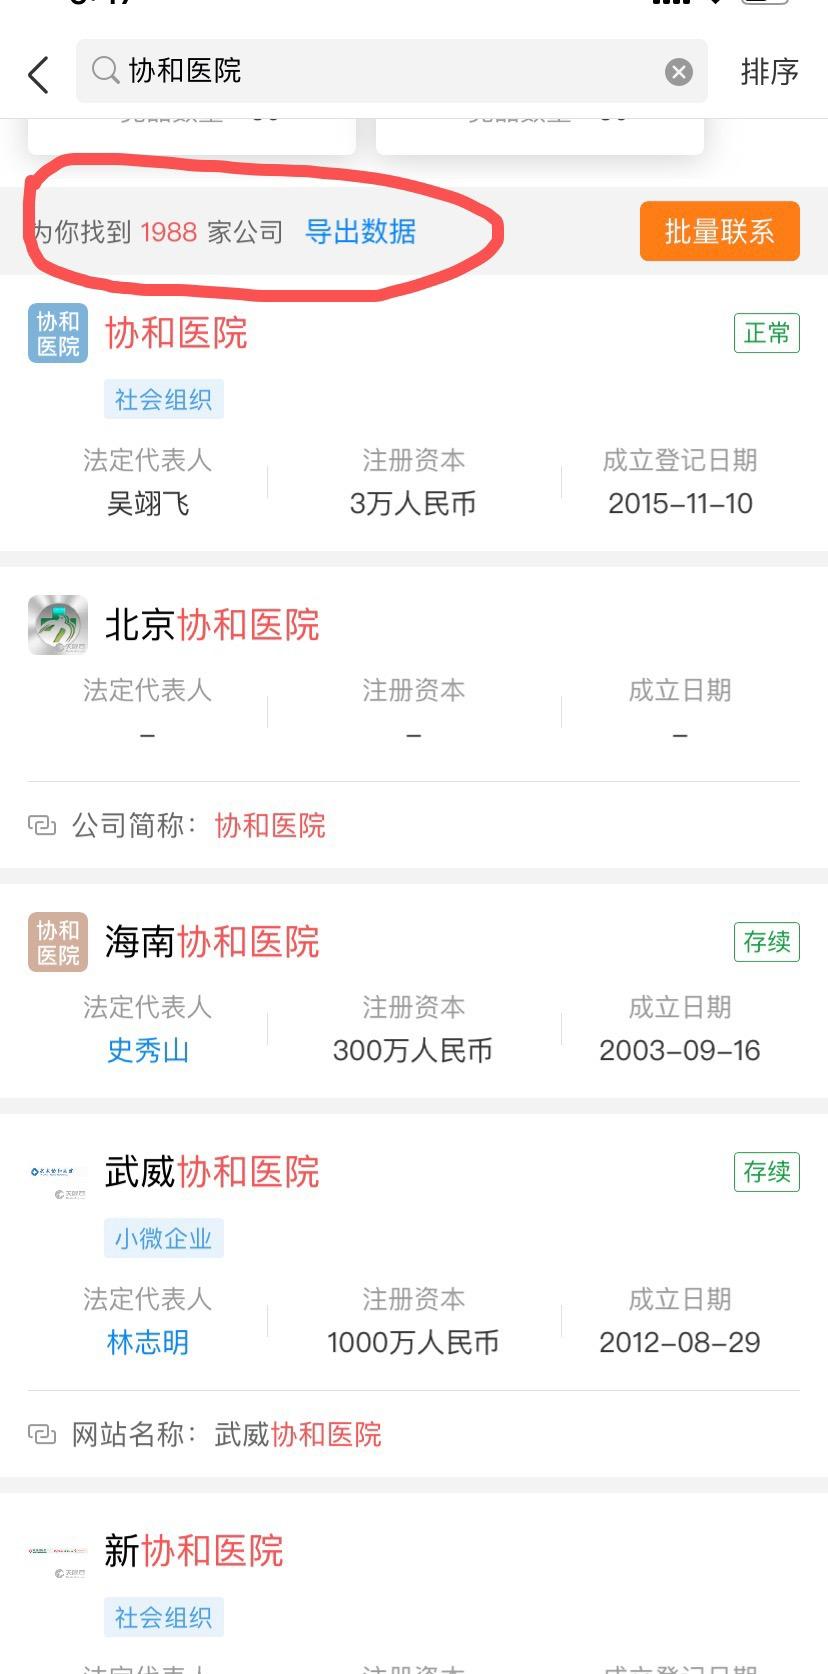 ag平台游戏注册_必读!中国工业70年发展与战略演进